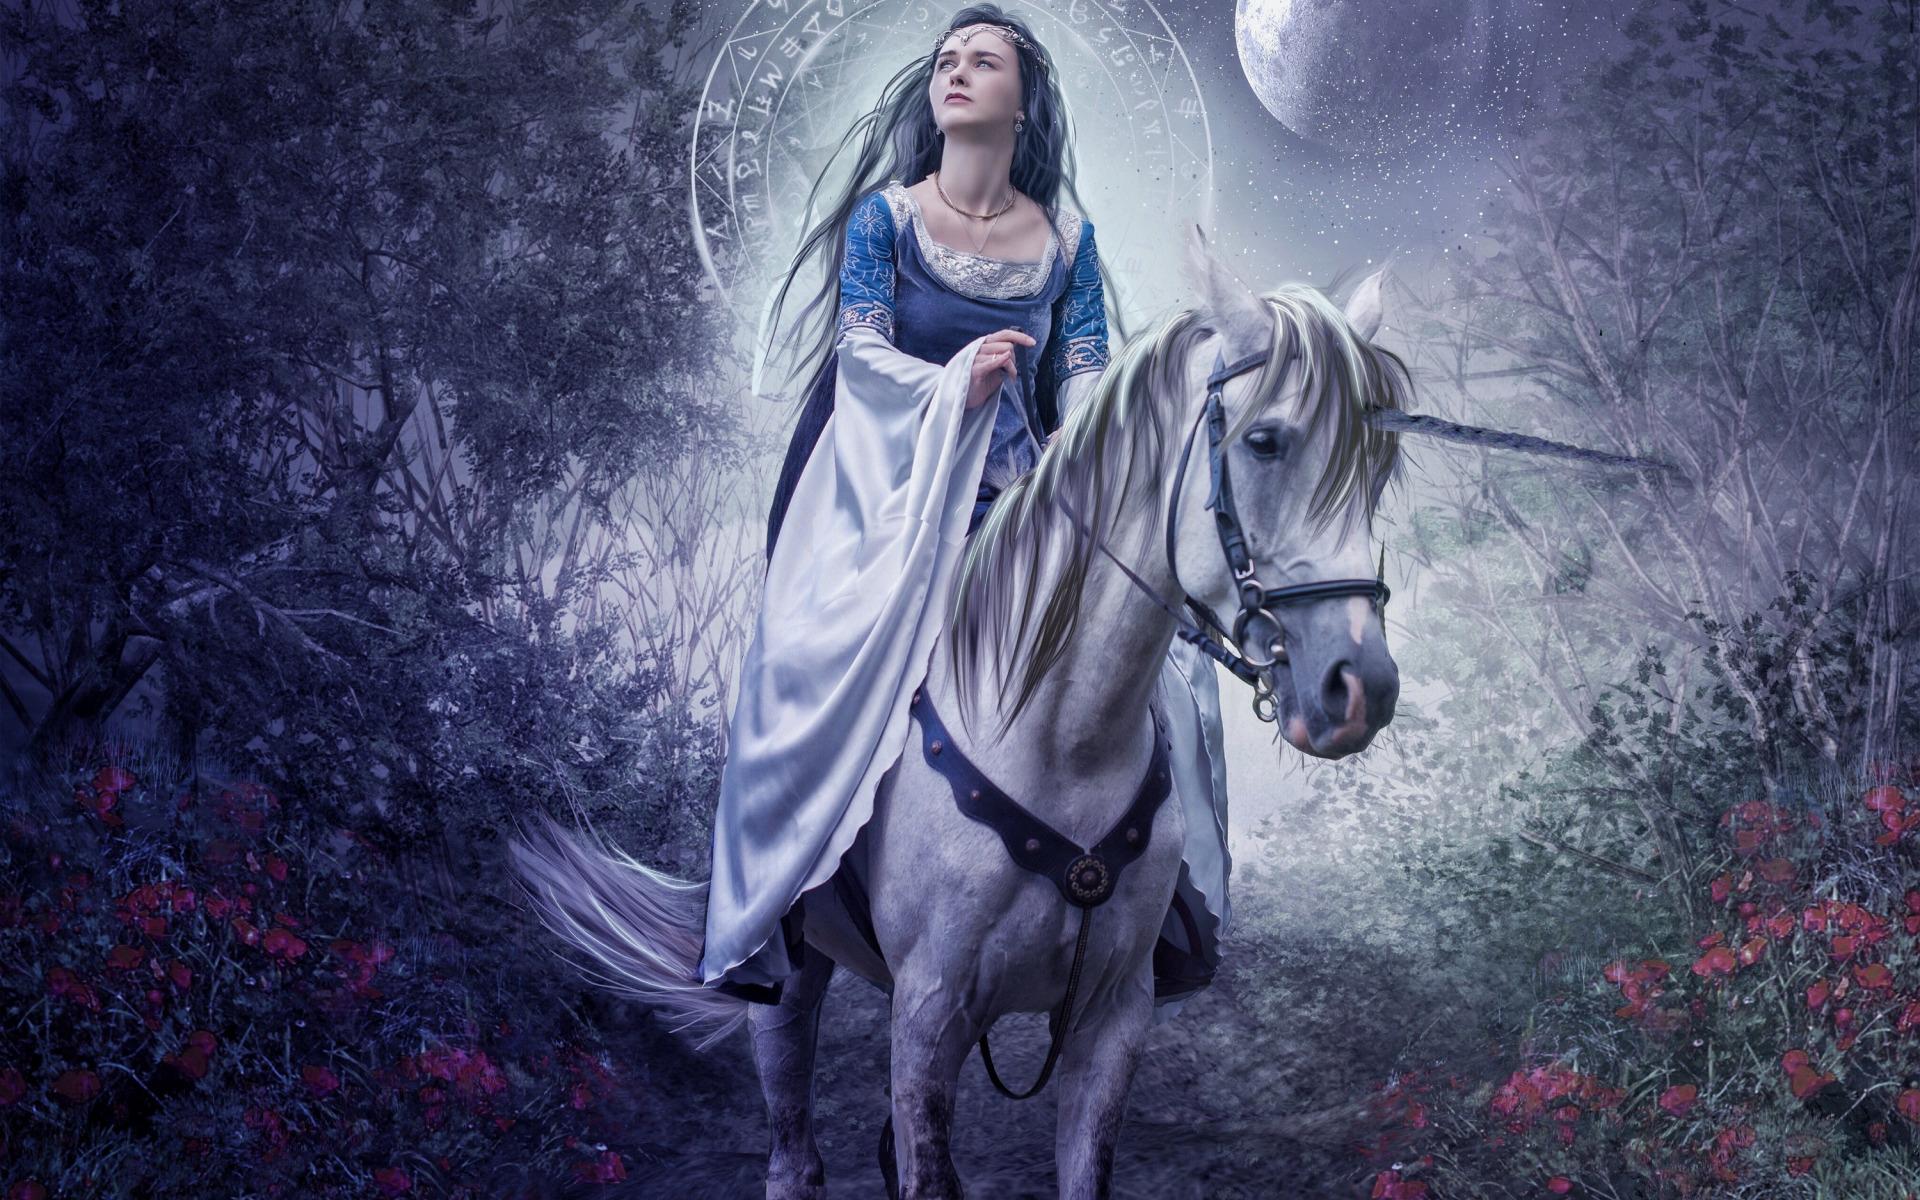 Картинки богинь на конях